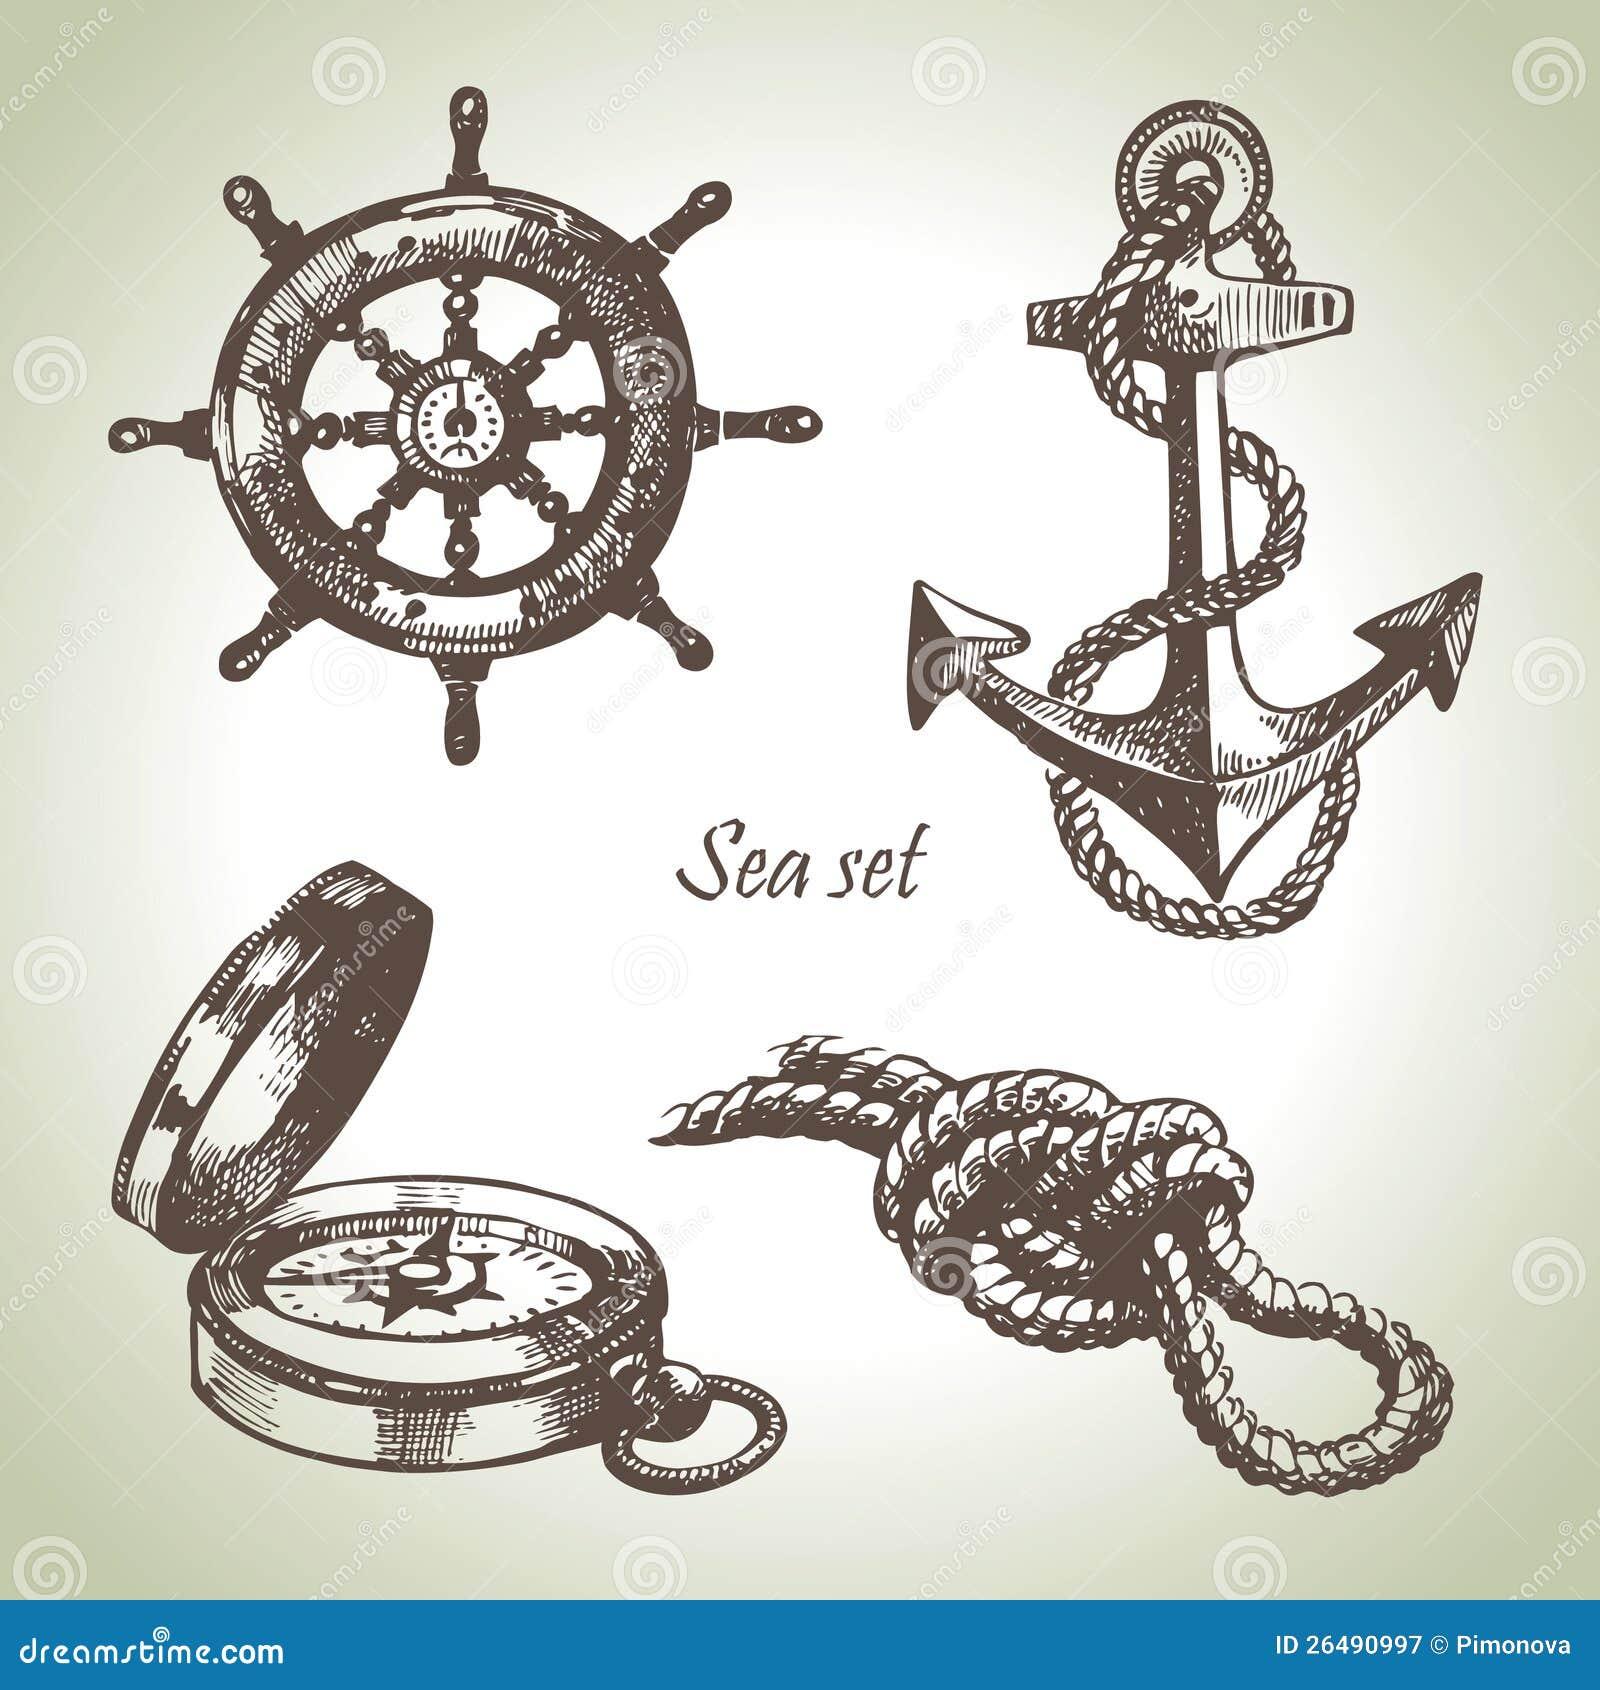 Key Elements Of Nautical Style: Sea Set Of Nautical Design Elements Stock Vector